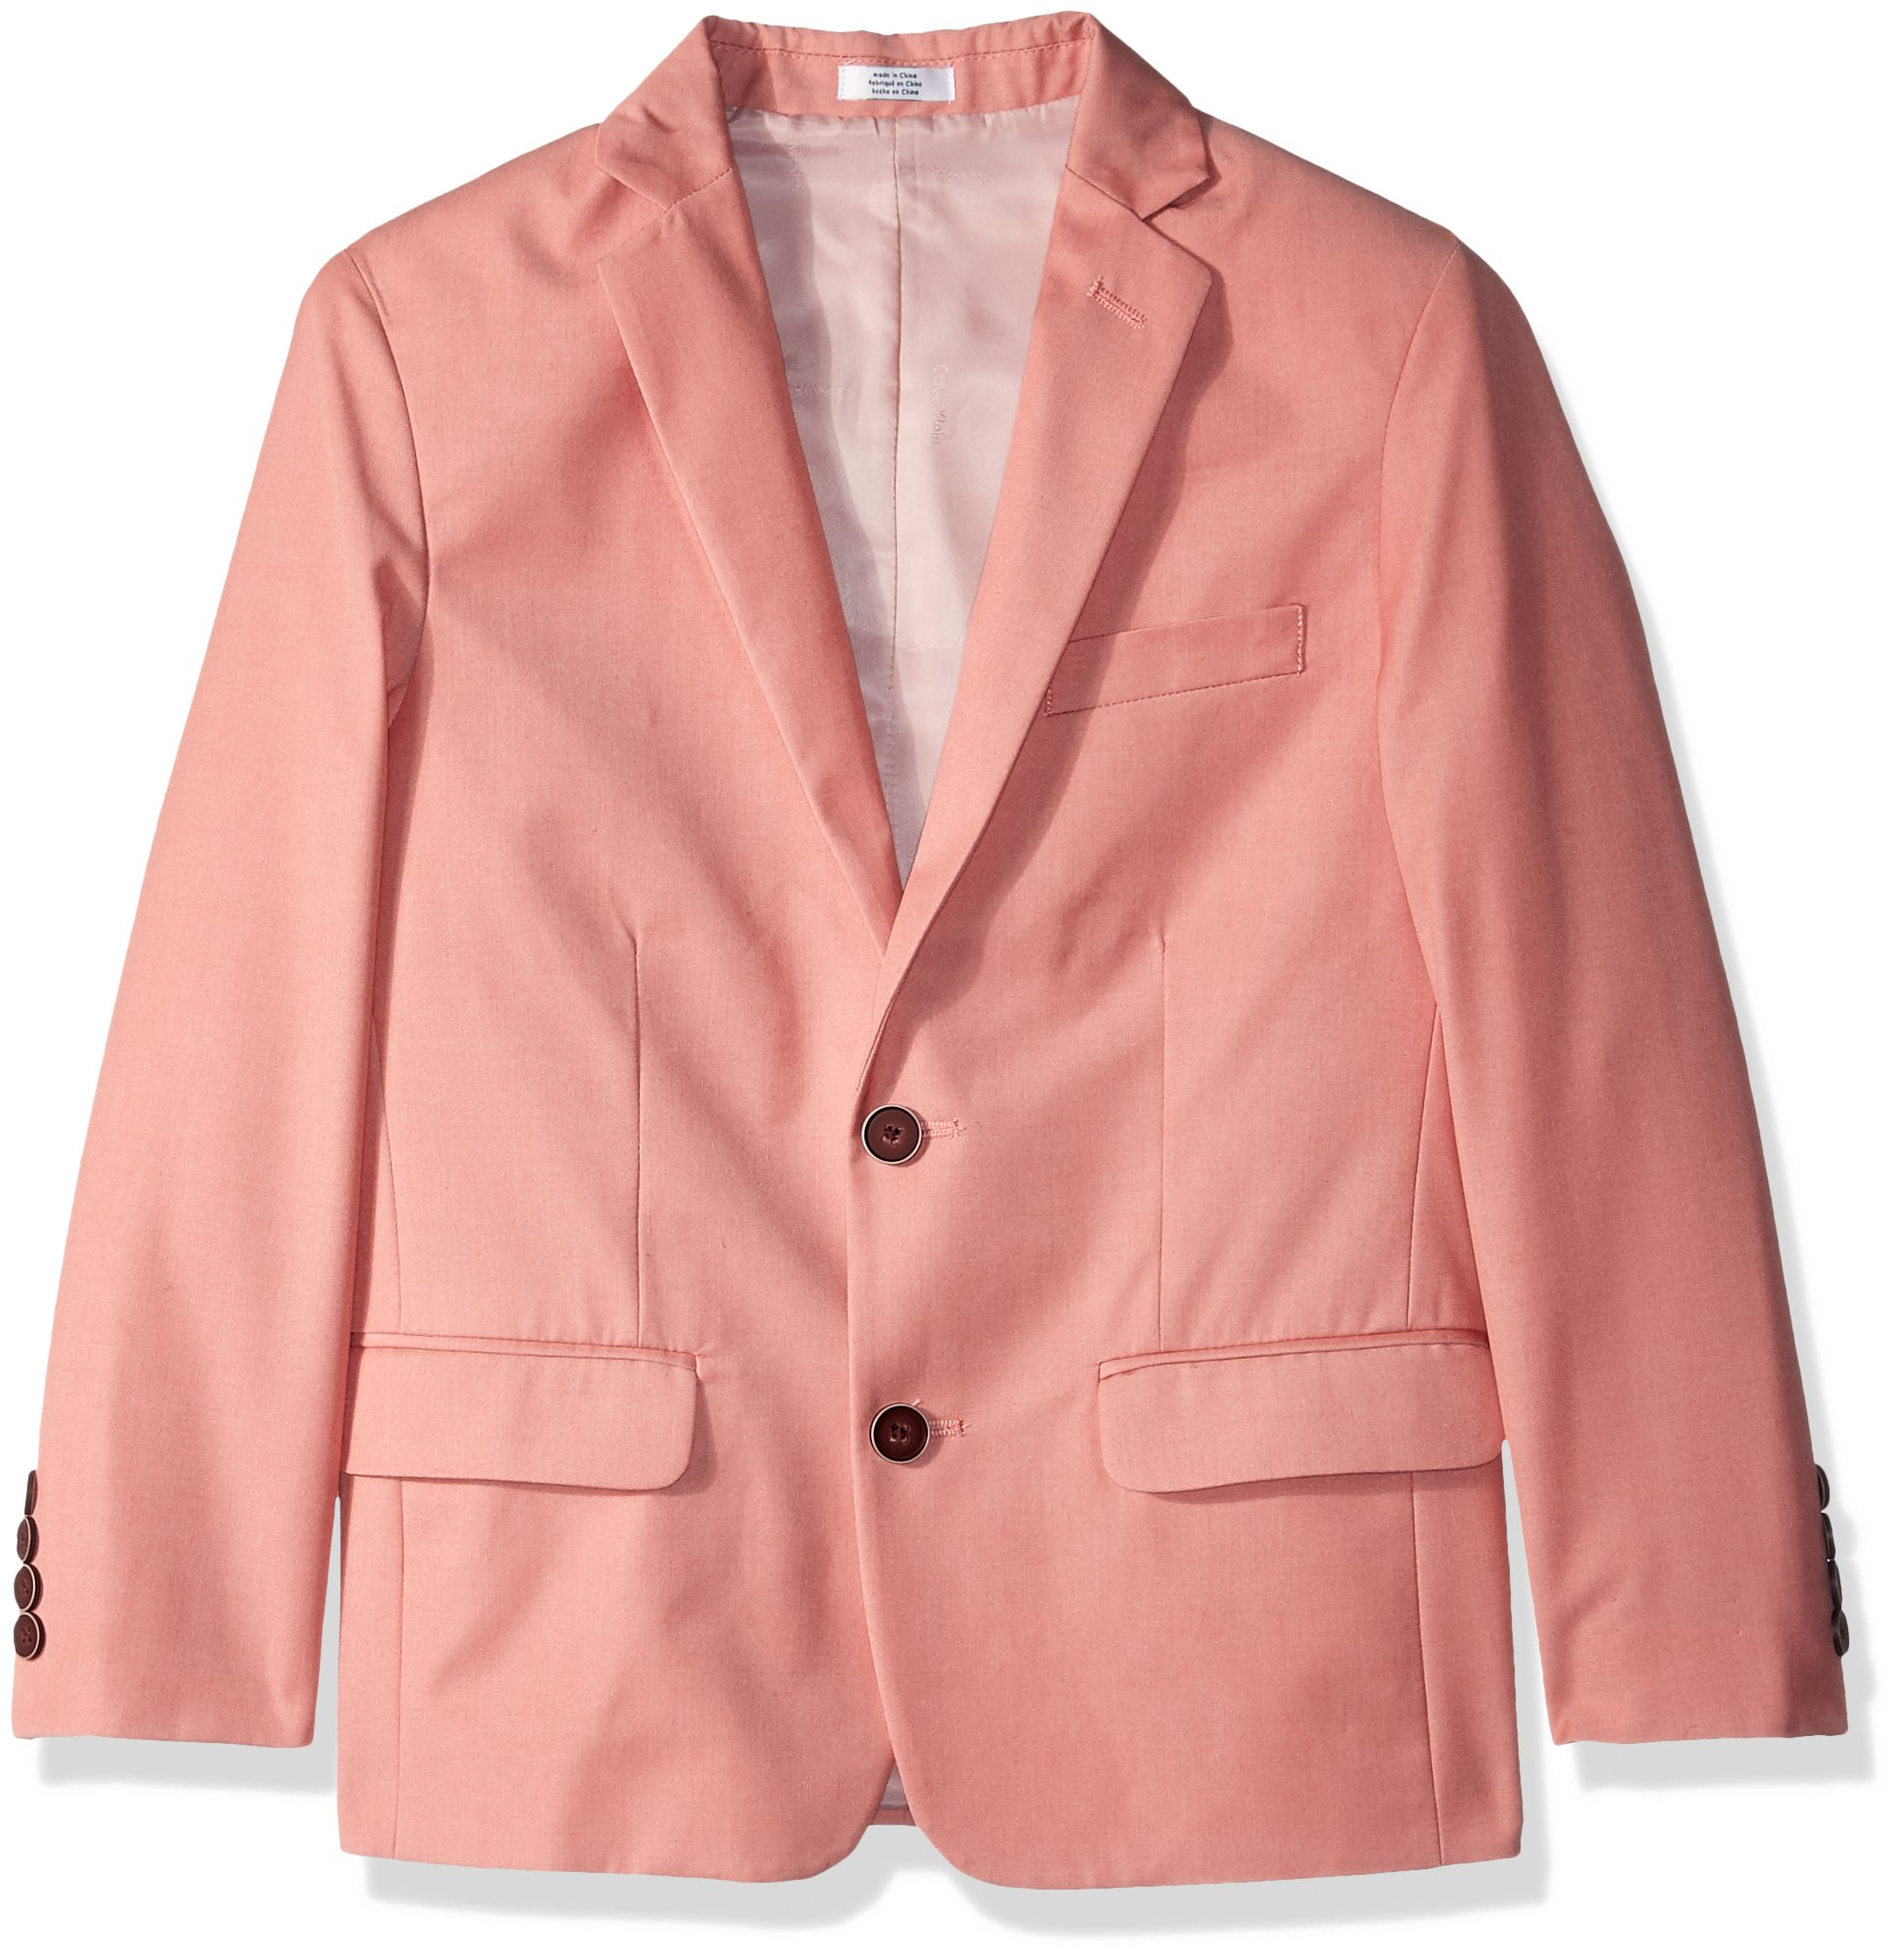 Calvin Klein Big Boys' Linen Blazer Jacket, Blushing, 16